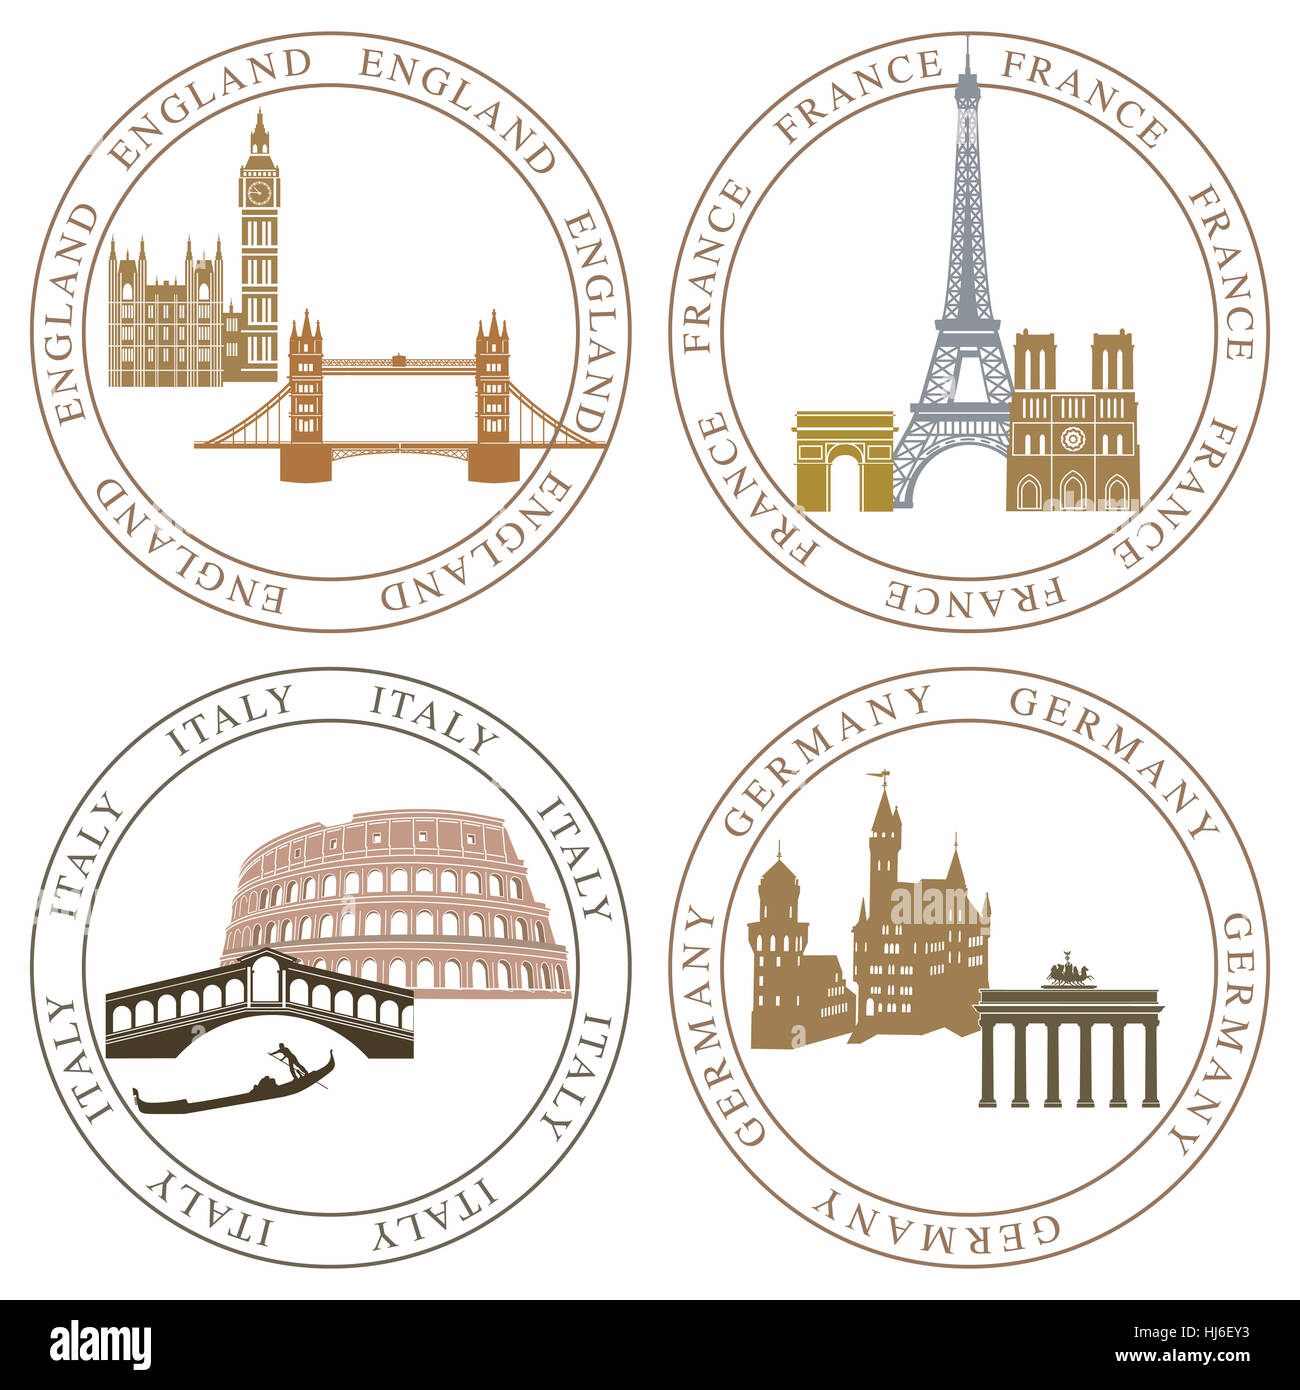 travel, historical, city, town, culture, famous, acquainted, tourism, venice, - Stock Image